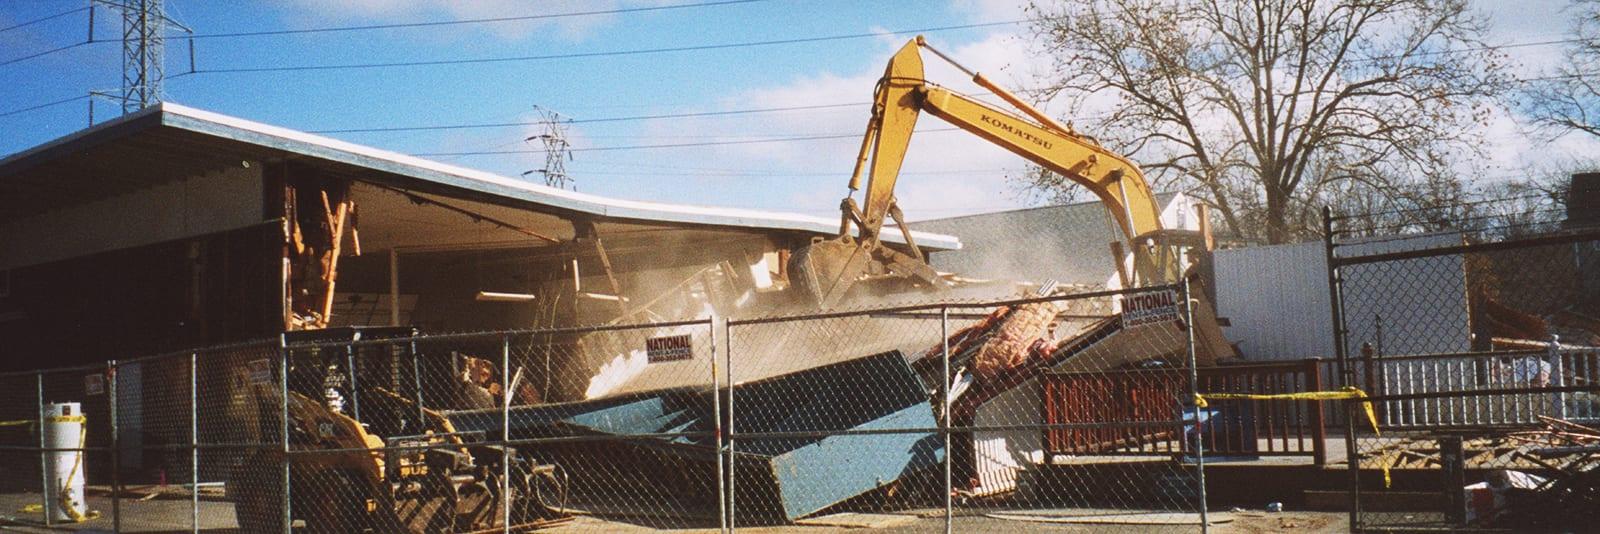 Old Building being demolished